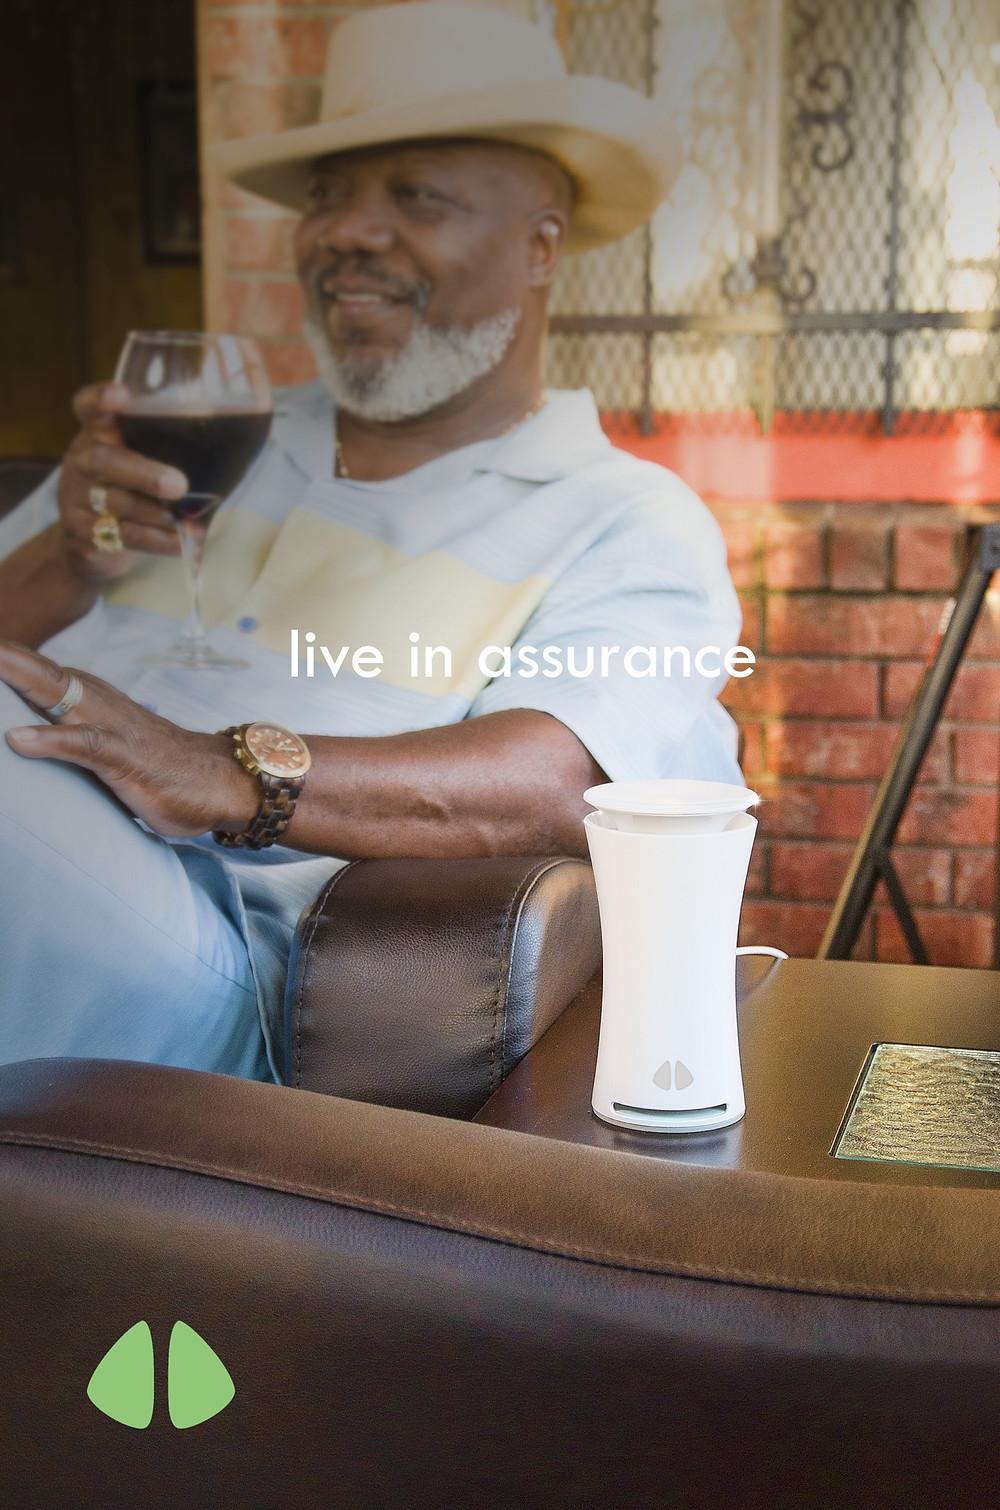 visit www.uhooair.com/HiltonKelley for the Special Edition uHoo air Sensor